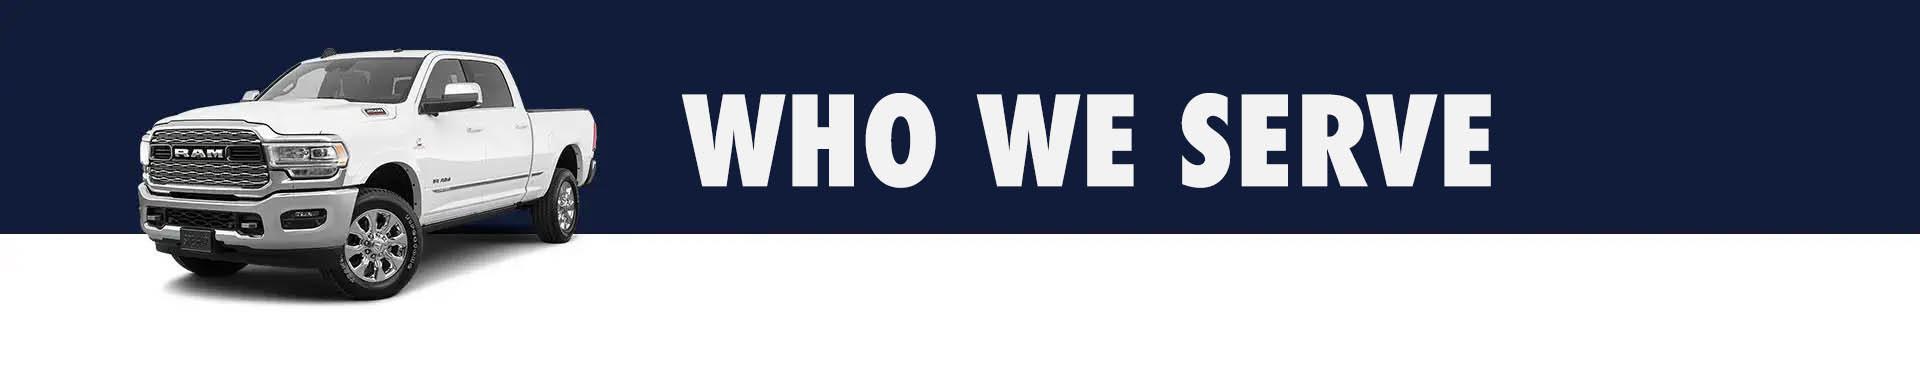 who-we-serve-banner